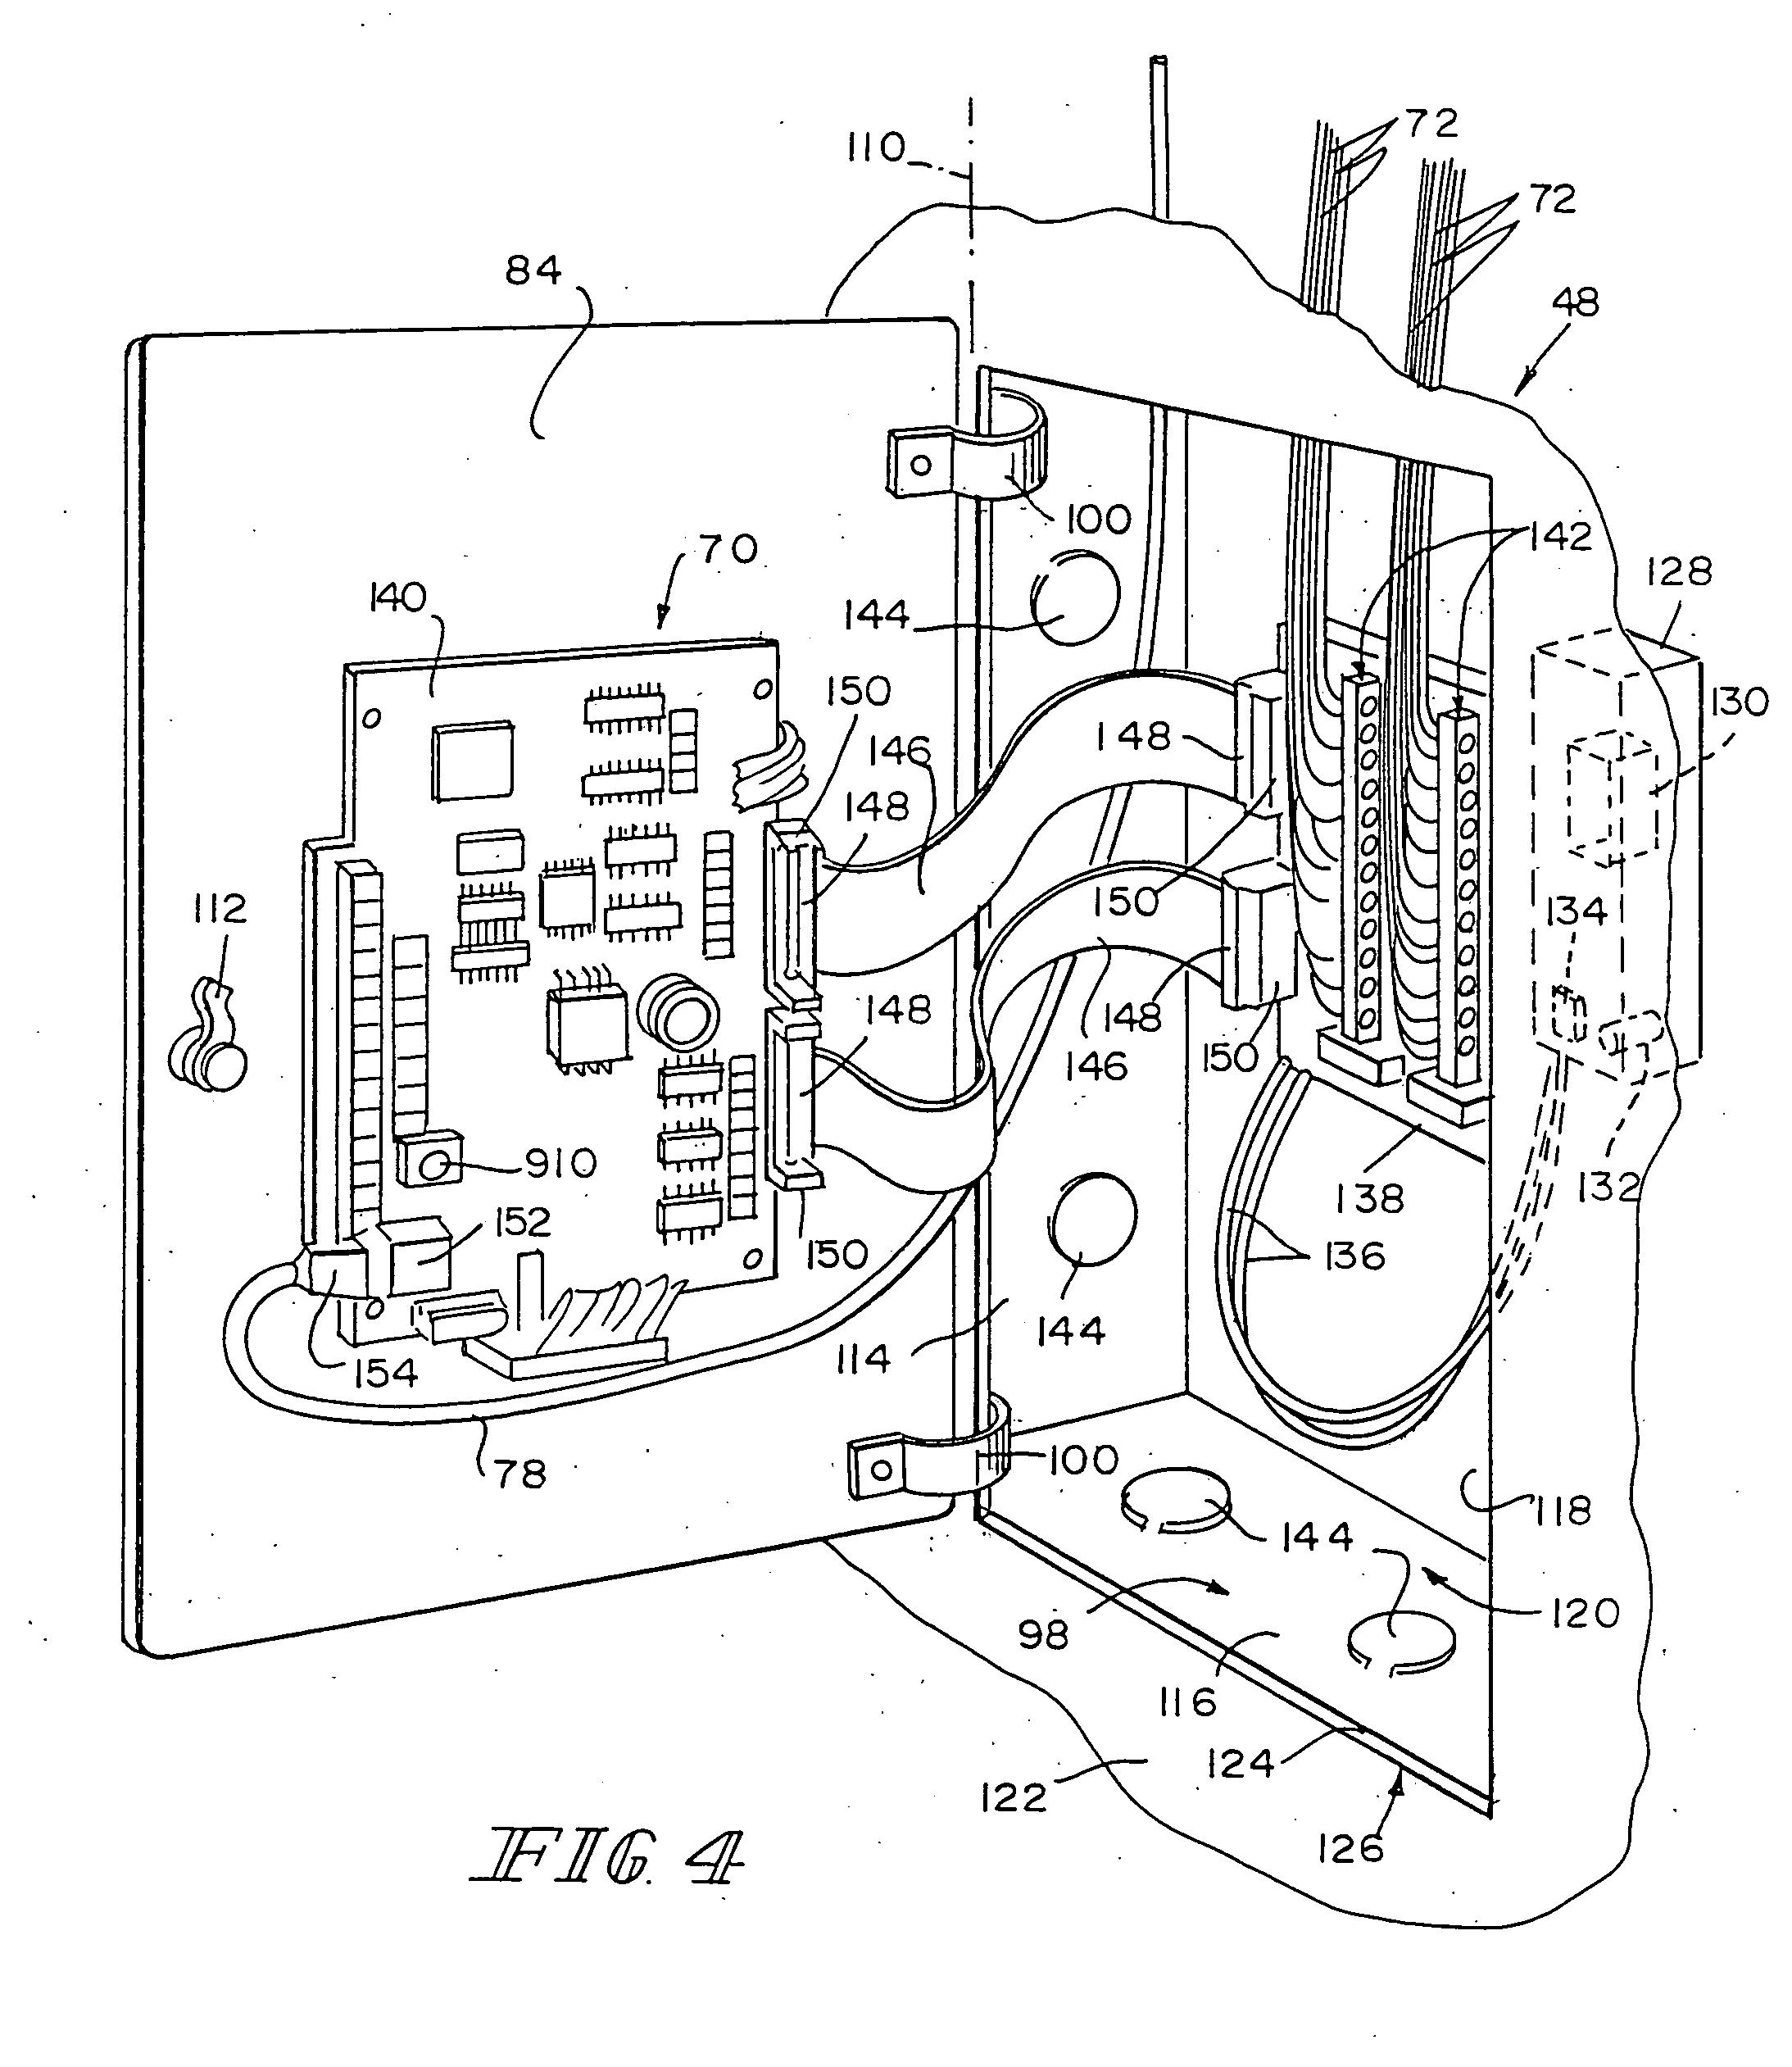 Glamorous Mercruiser 140 Wiring-diagram Ideas - Best Image ...